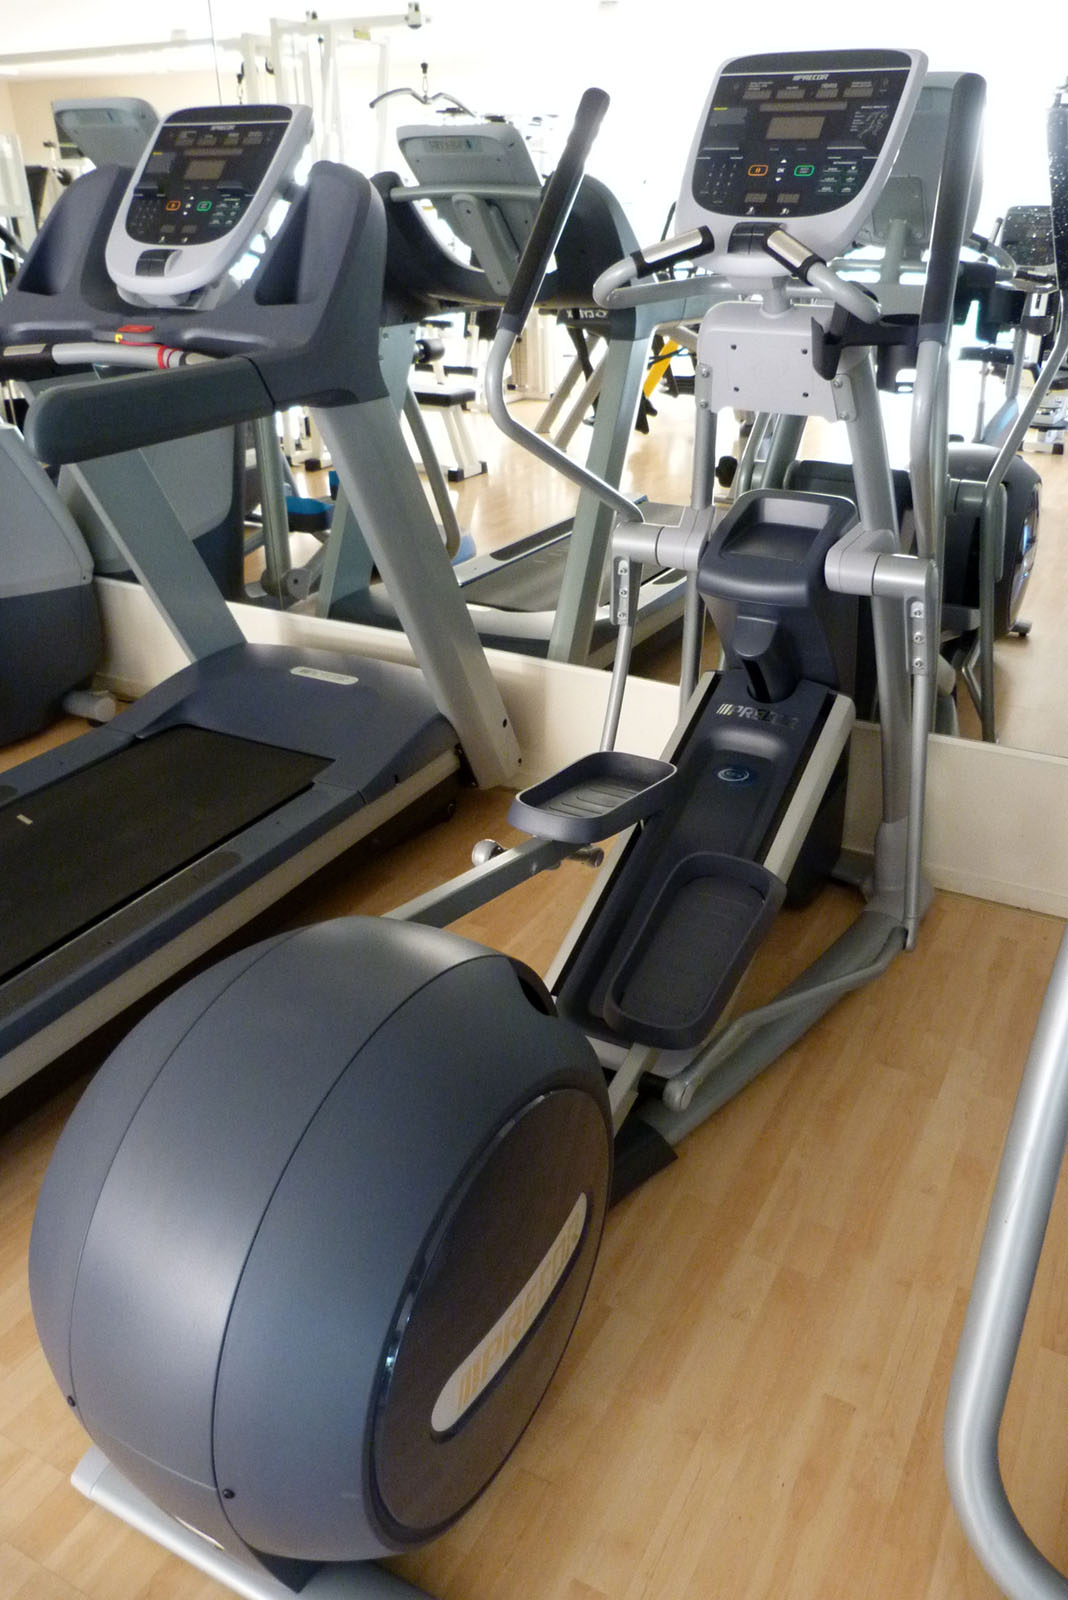 salle de sport bergerac Elliptique Fitness Crosstrainer EFX 835 CroosRamp Precor 1